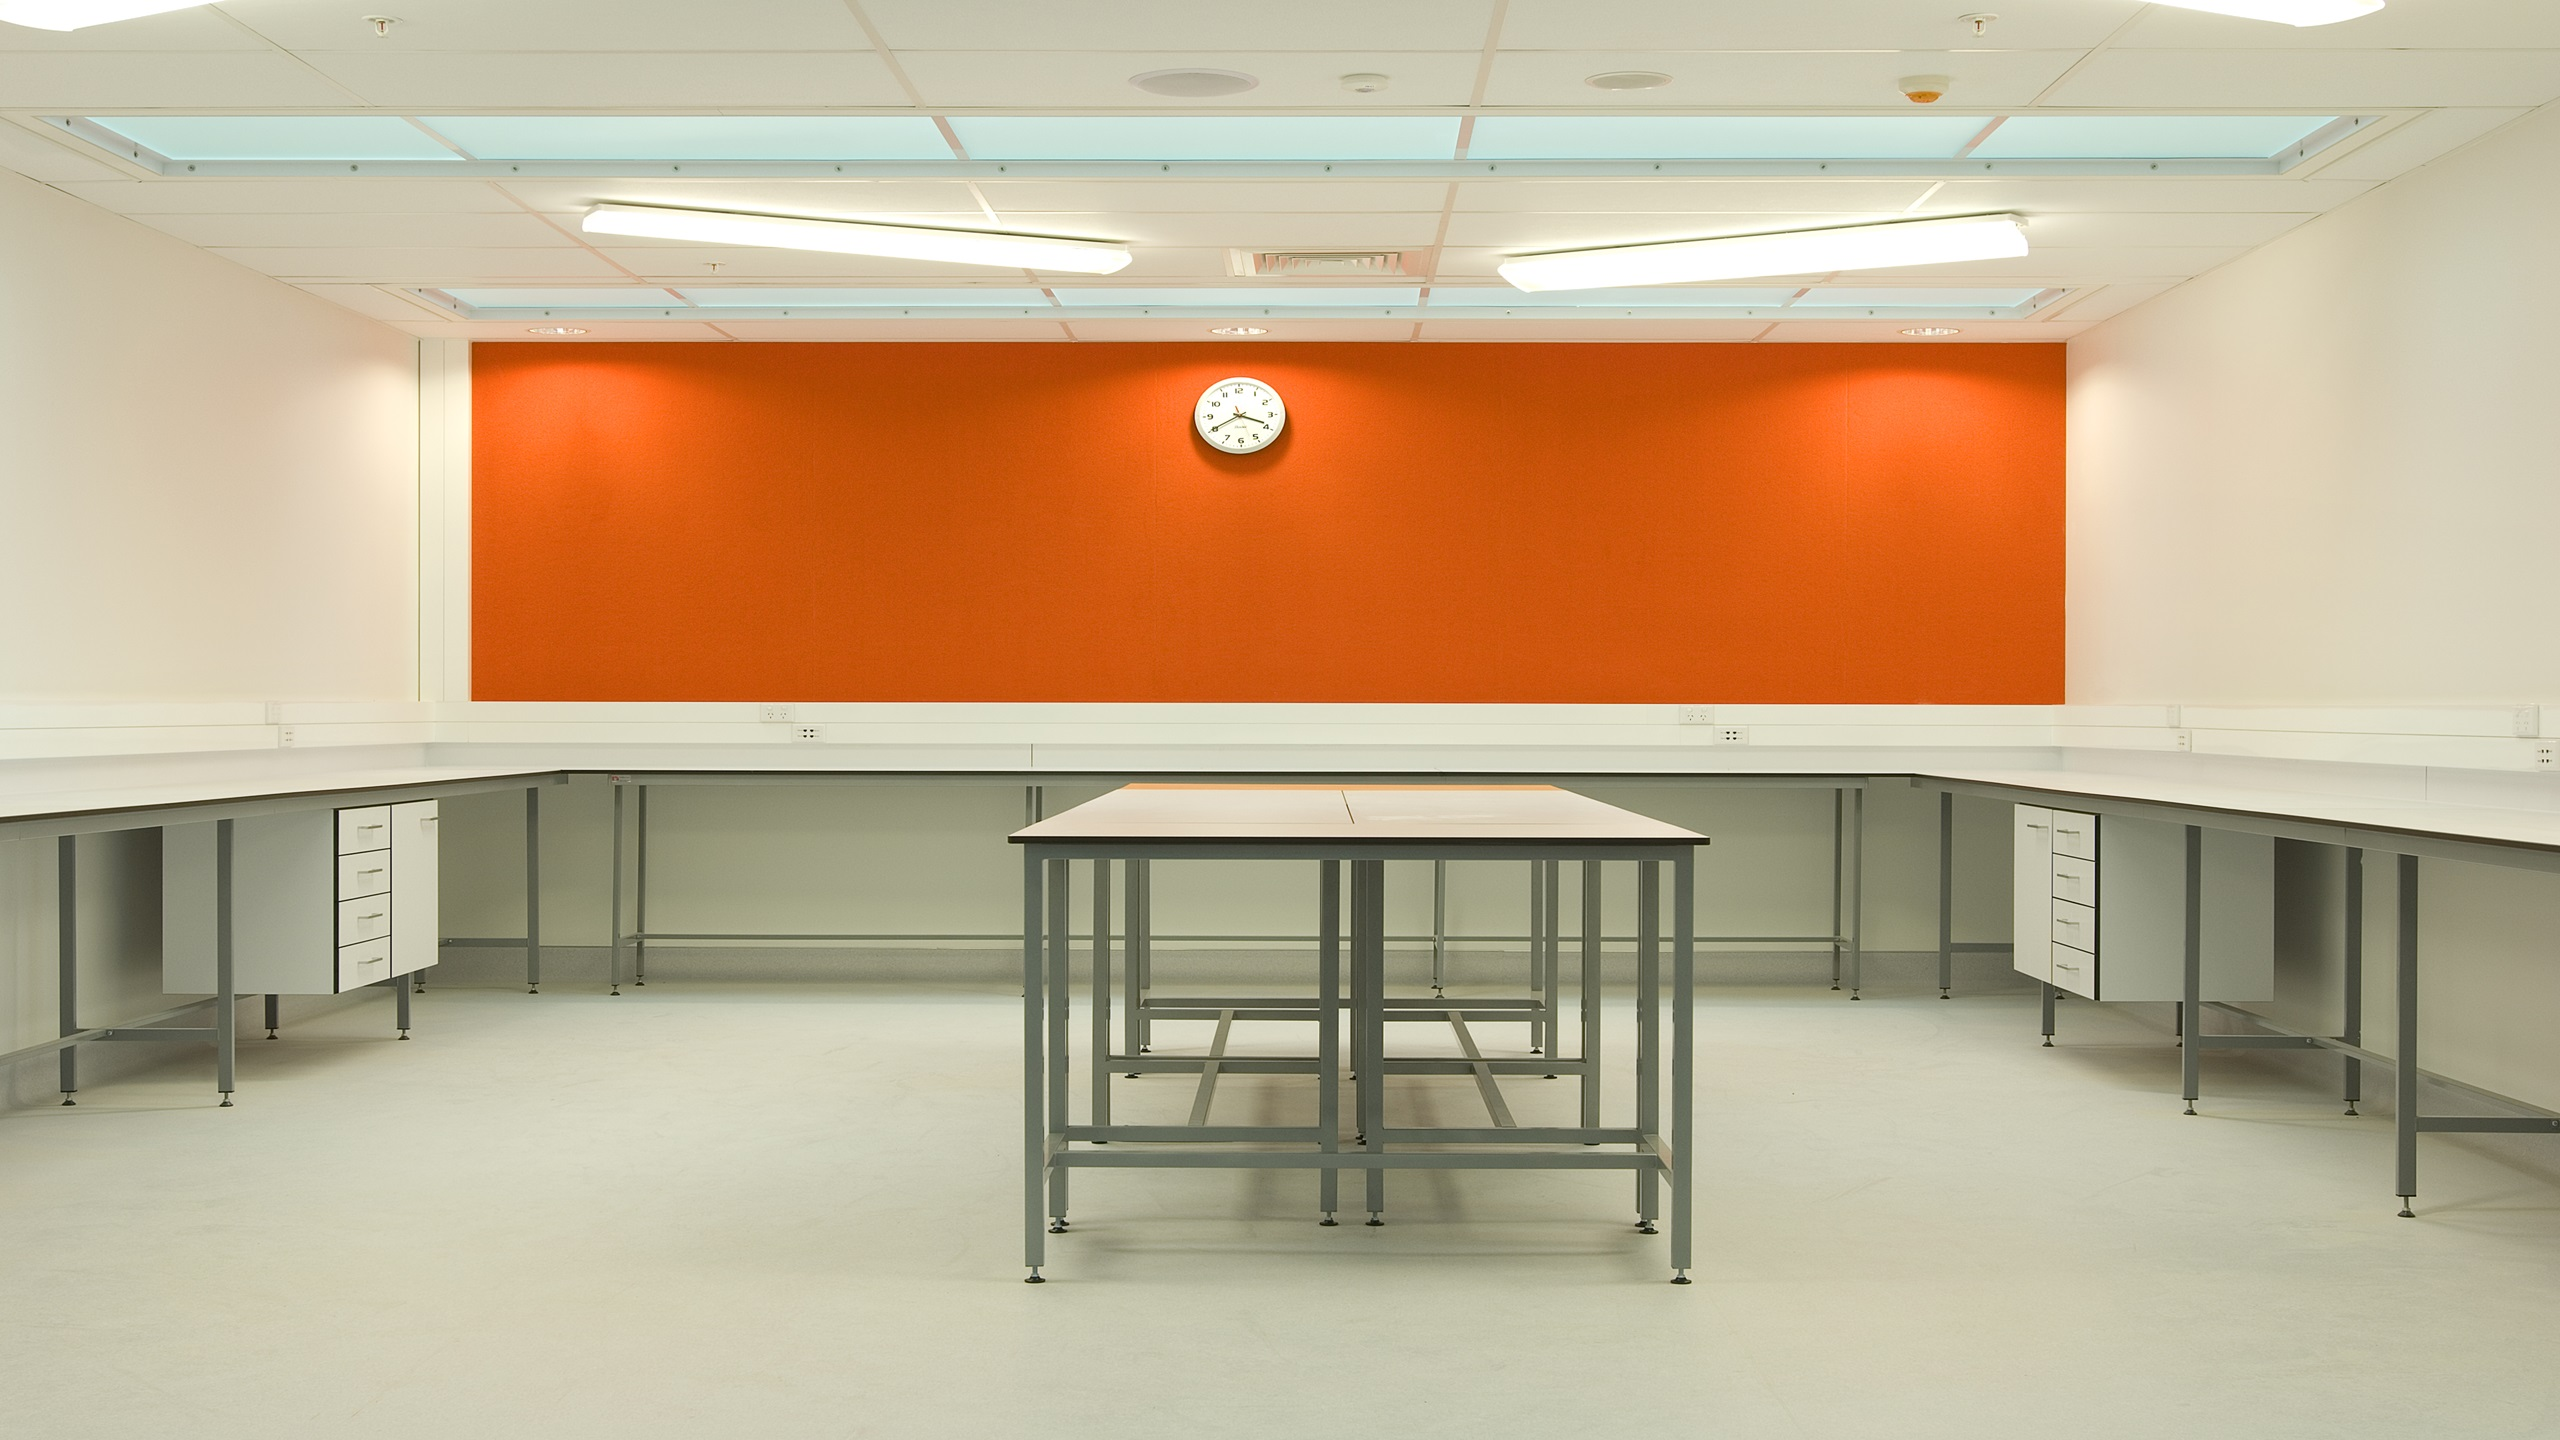 Hobsonville Point Intermediate science room showing Premier Pinboard in orange installed on the wall